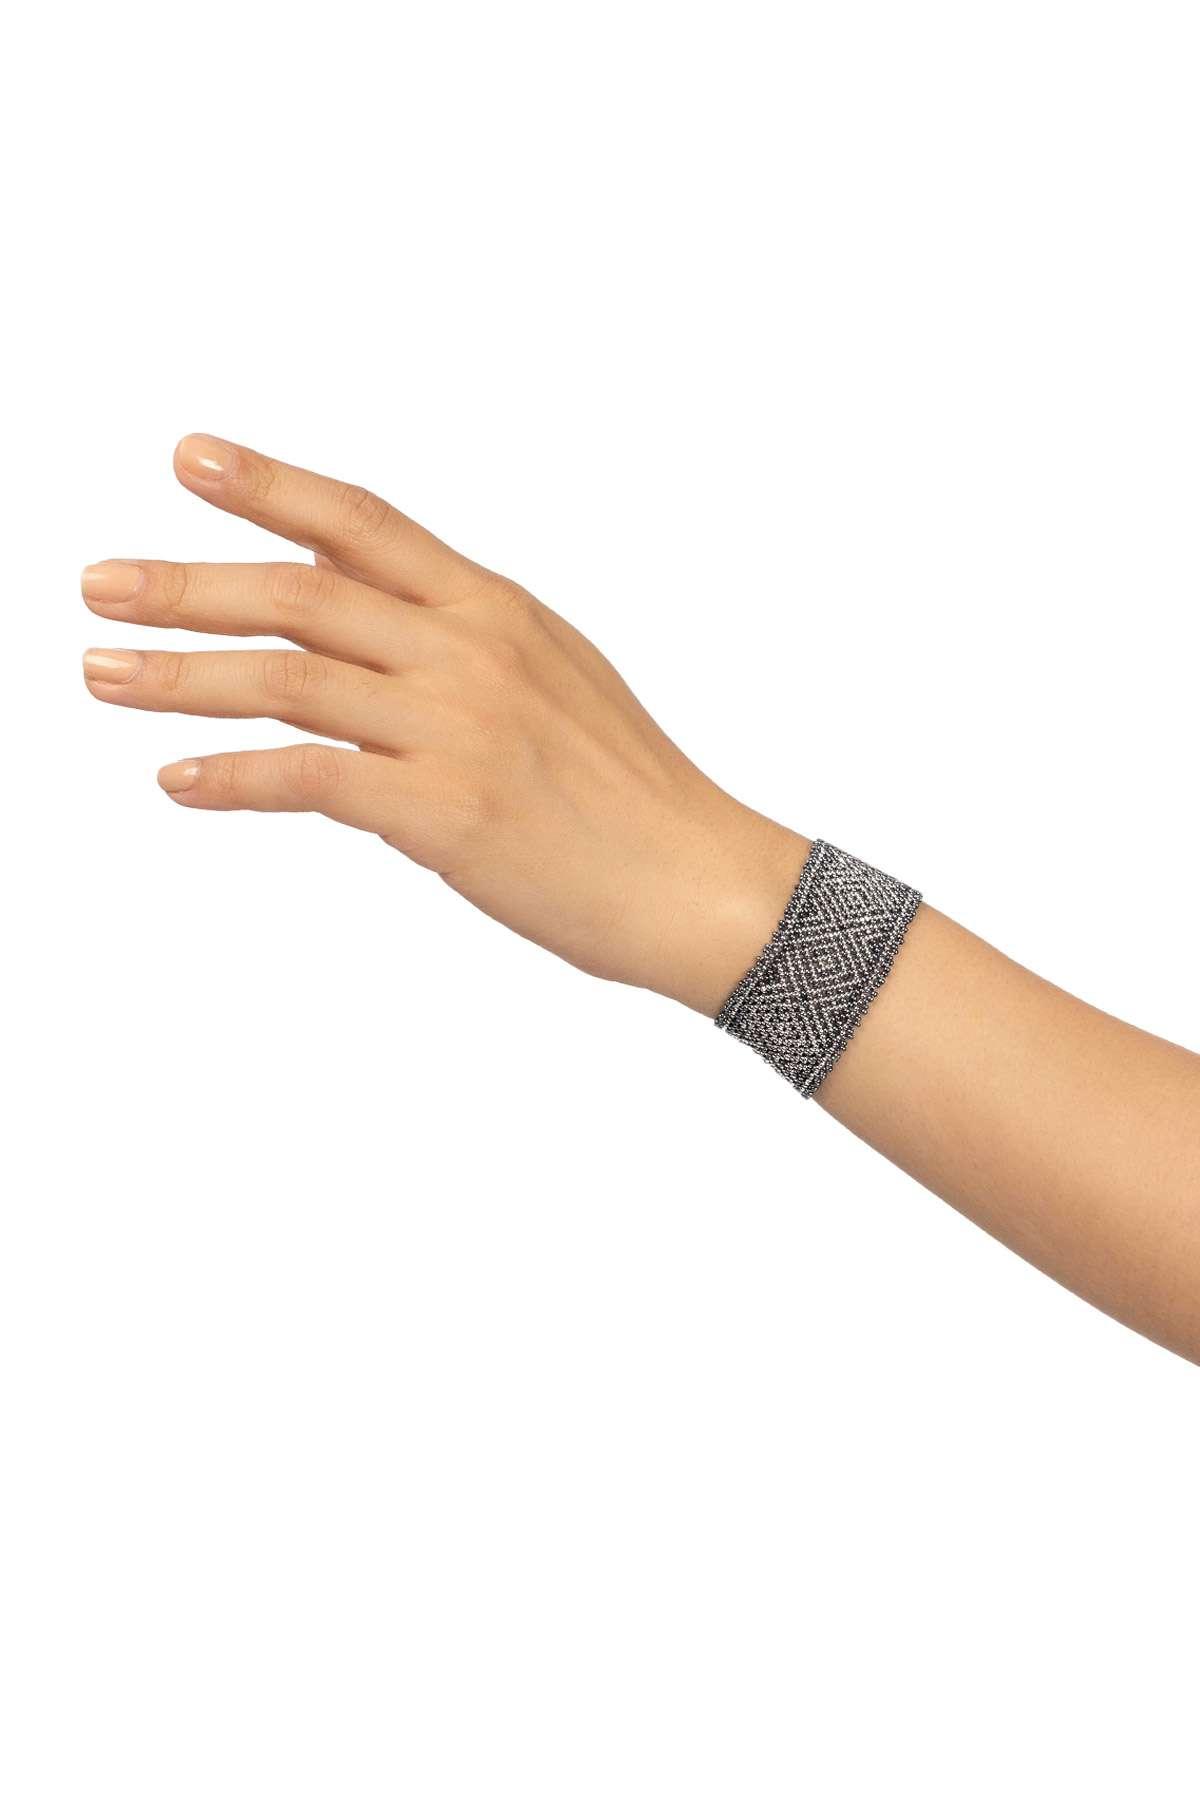 013-brazaletes-mediano-platino-gris-slt1